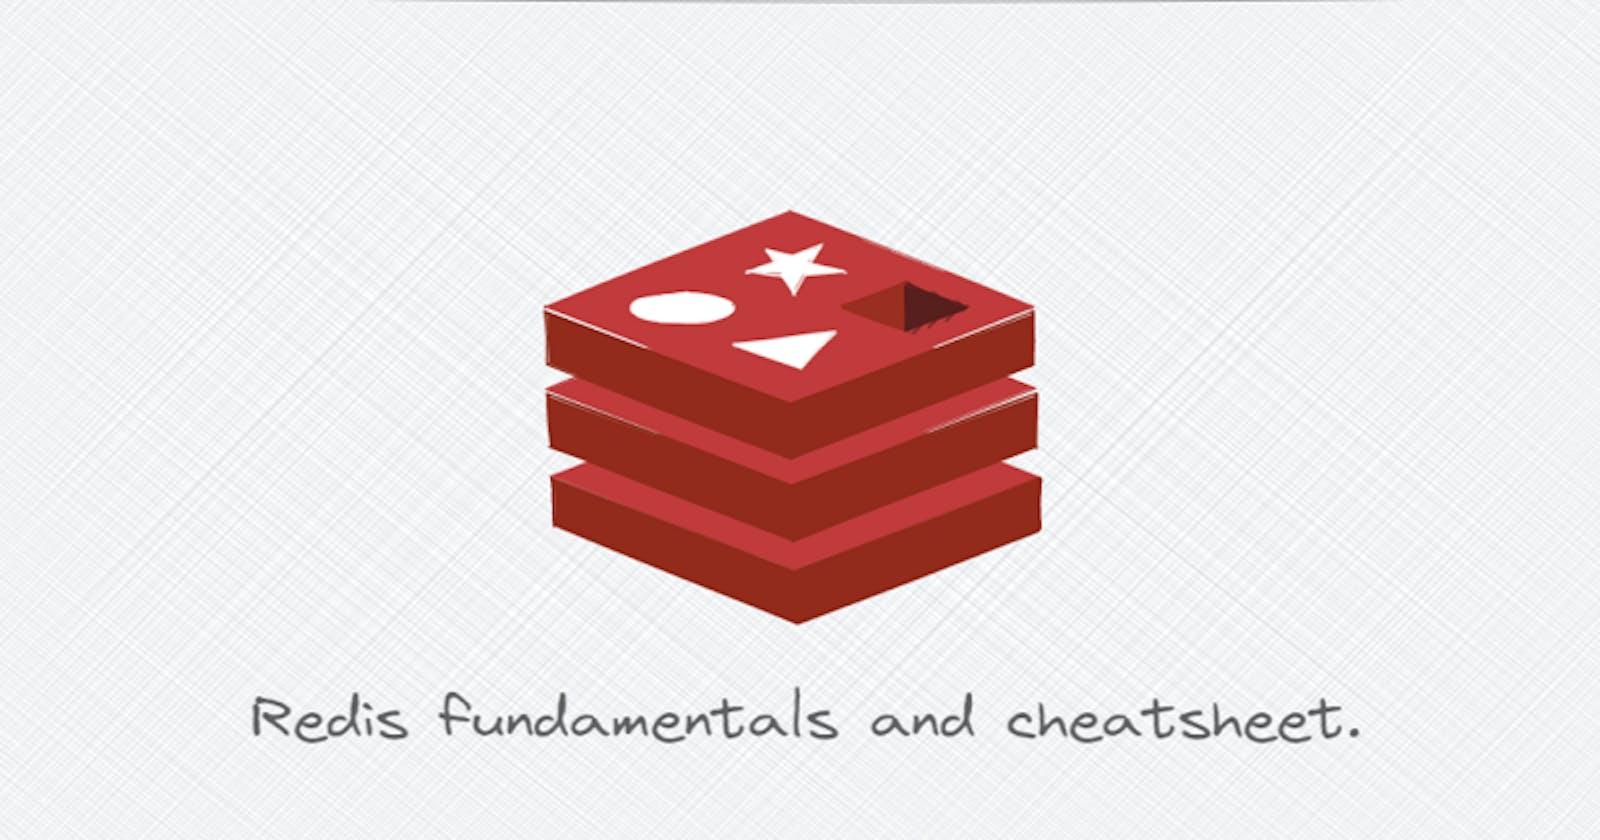 Redis fundamentals and cheatsheet.